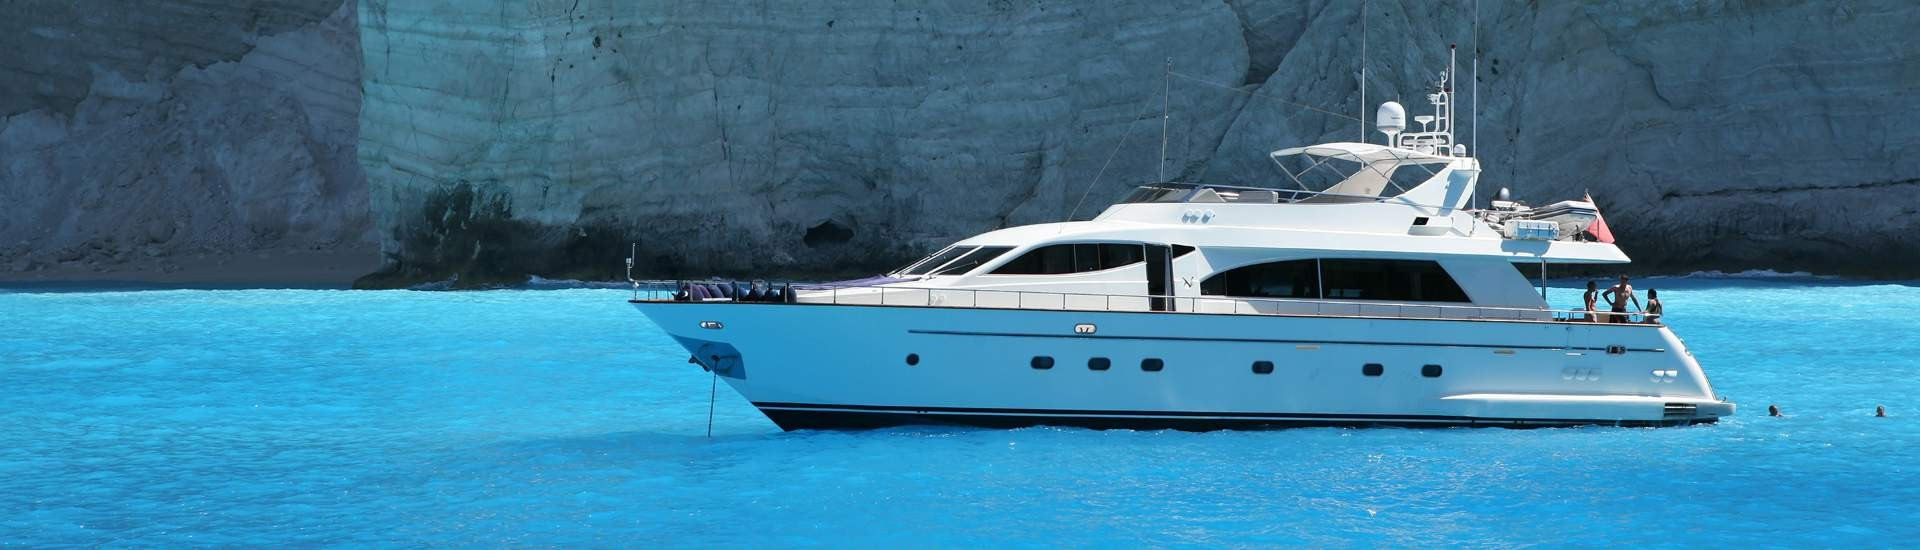 Yacht charter greece motor yachts greece for Motor boat rental greece